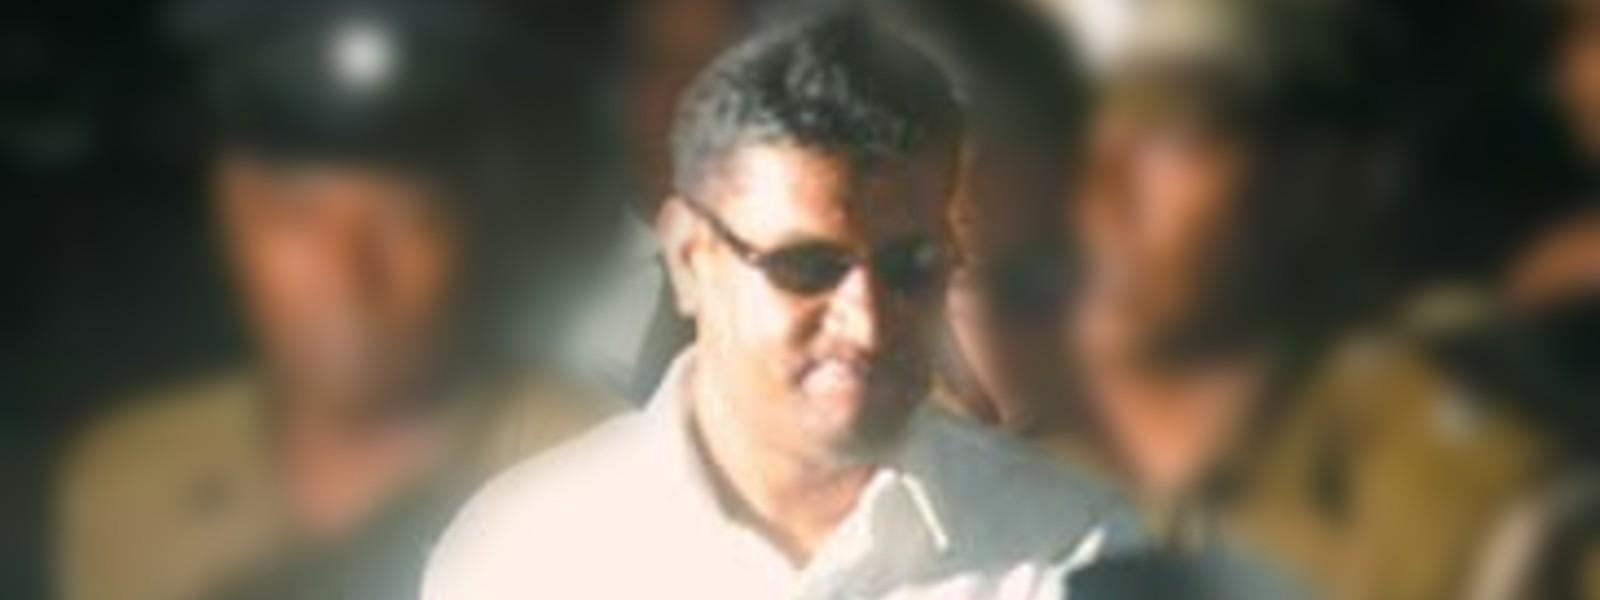 Underworld figure 'Potta Naufer', serving death sentence for killing a judge, dies of COVID